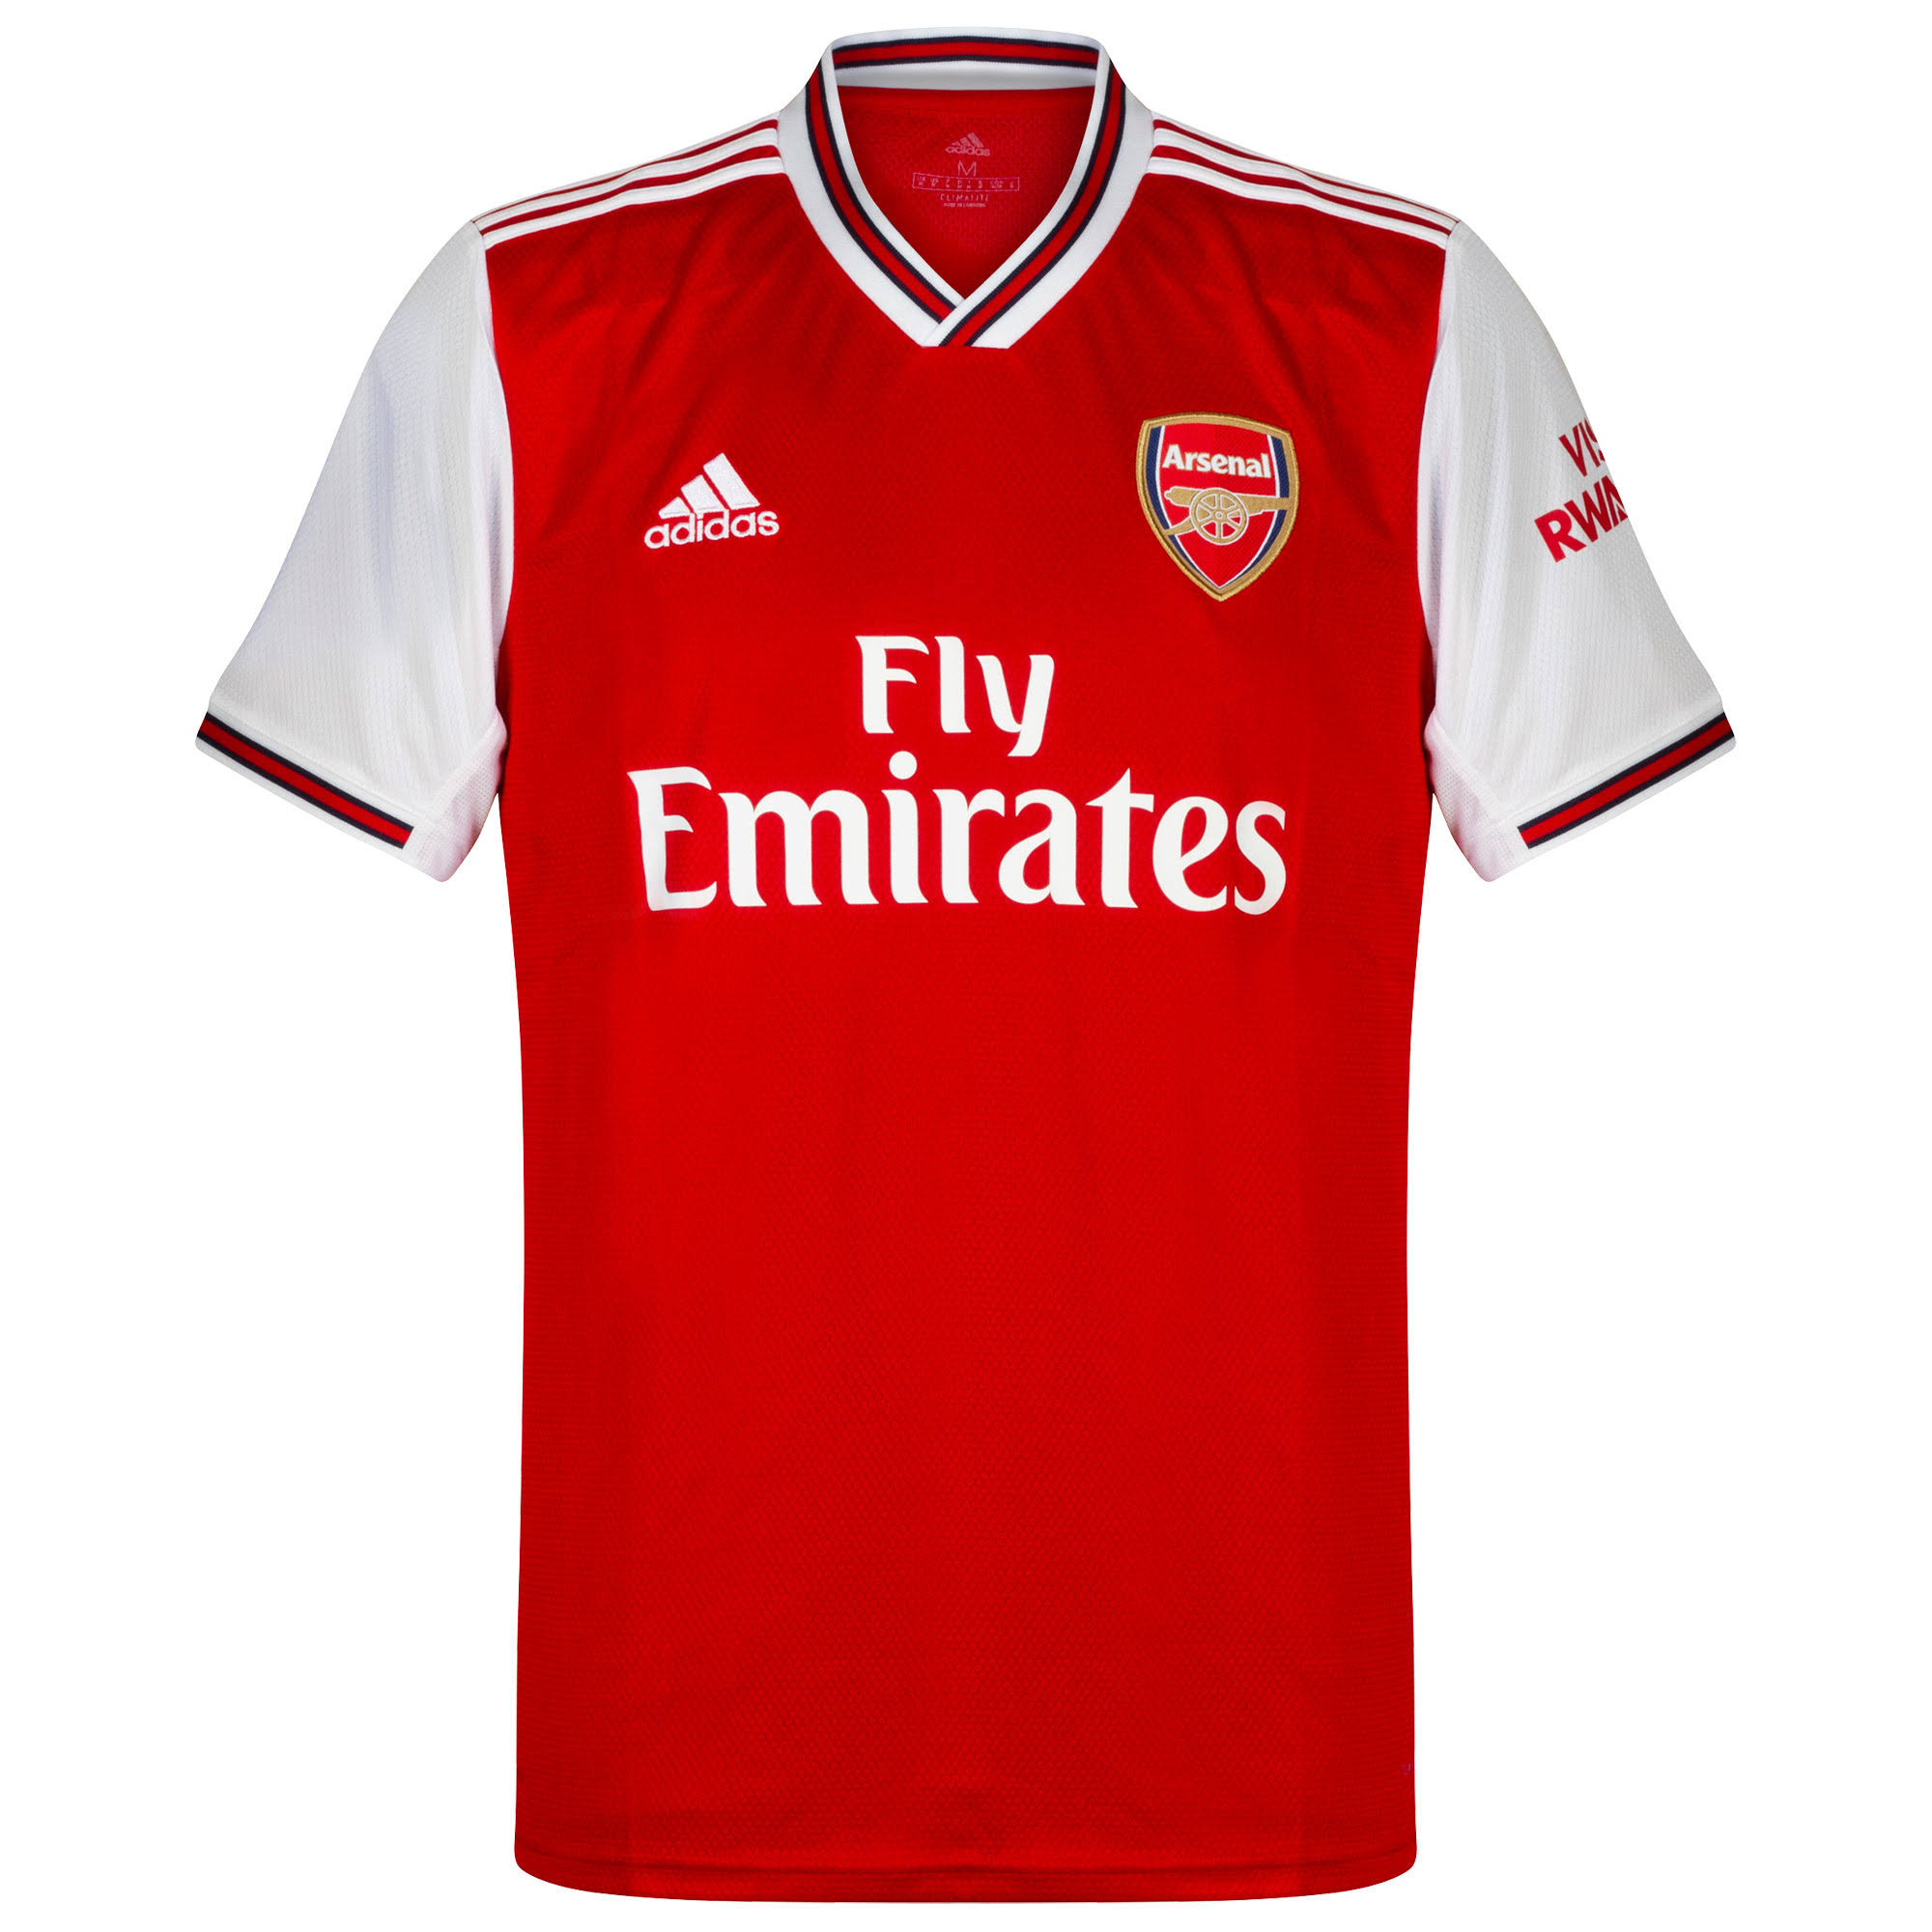 2019-2020 Arsenal Adidas Home Football Shirt